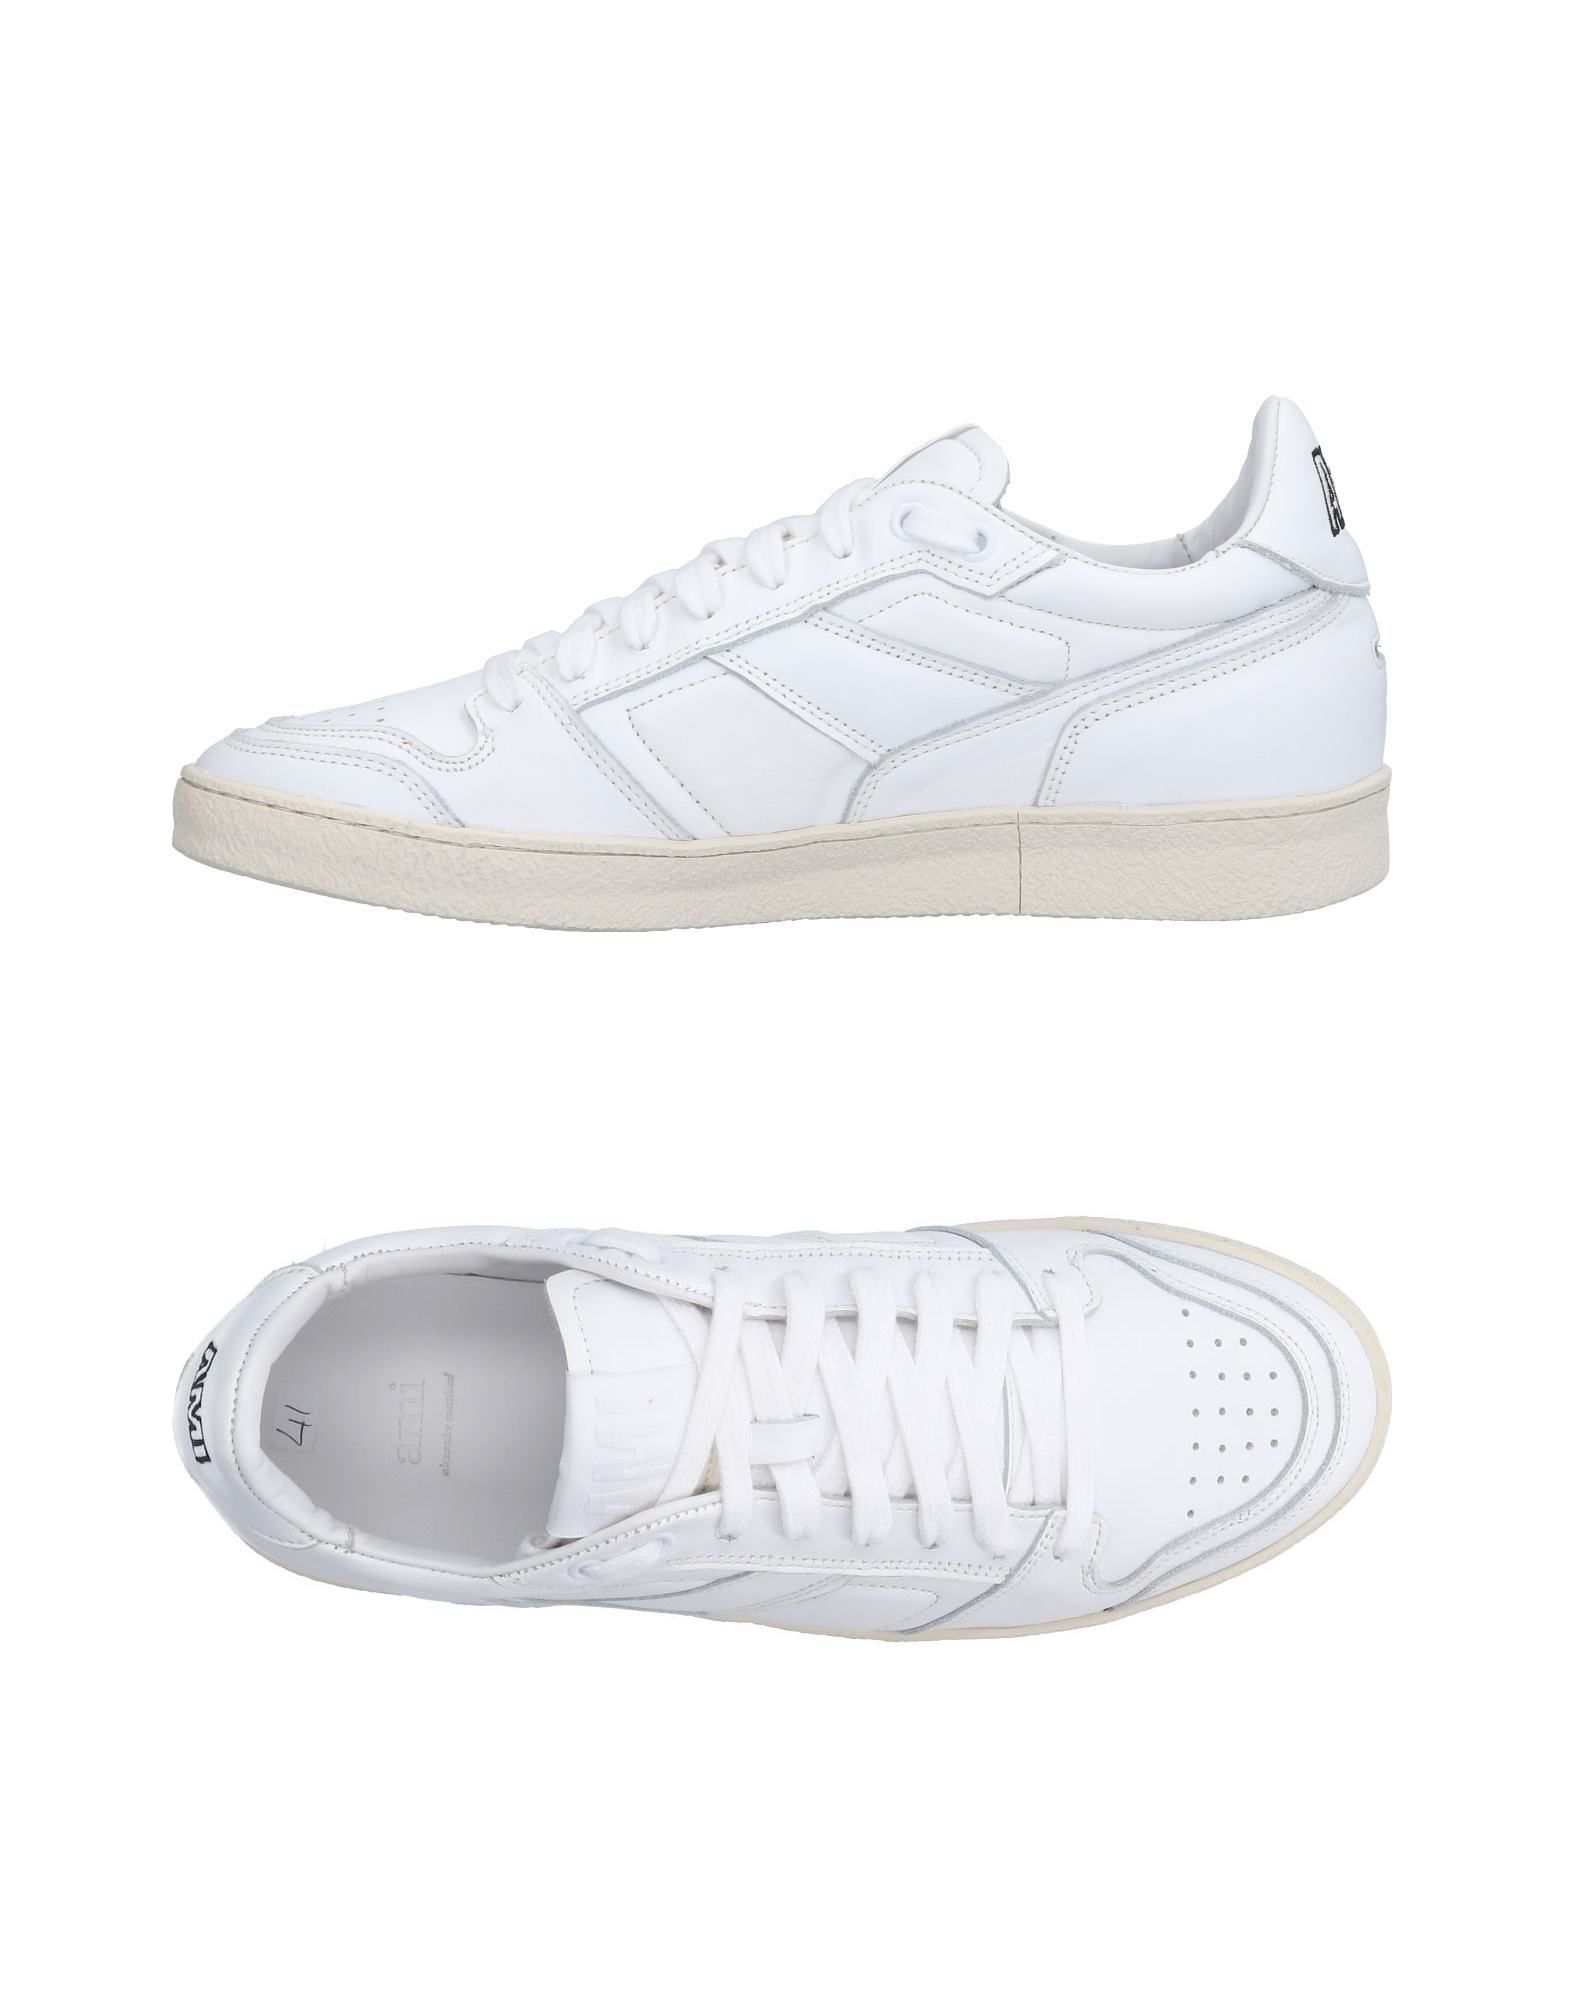 Ami Alexandre Mattiussi Sneakers Herren  11502162AK Gute Qualität beliebte Schuhe